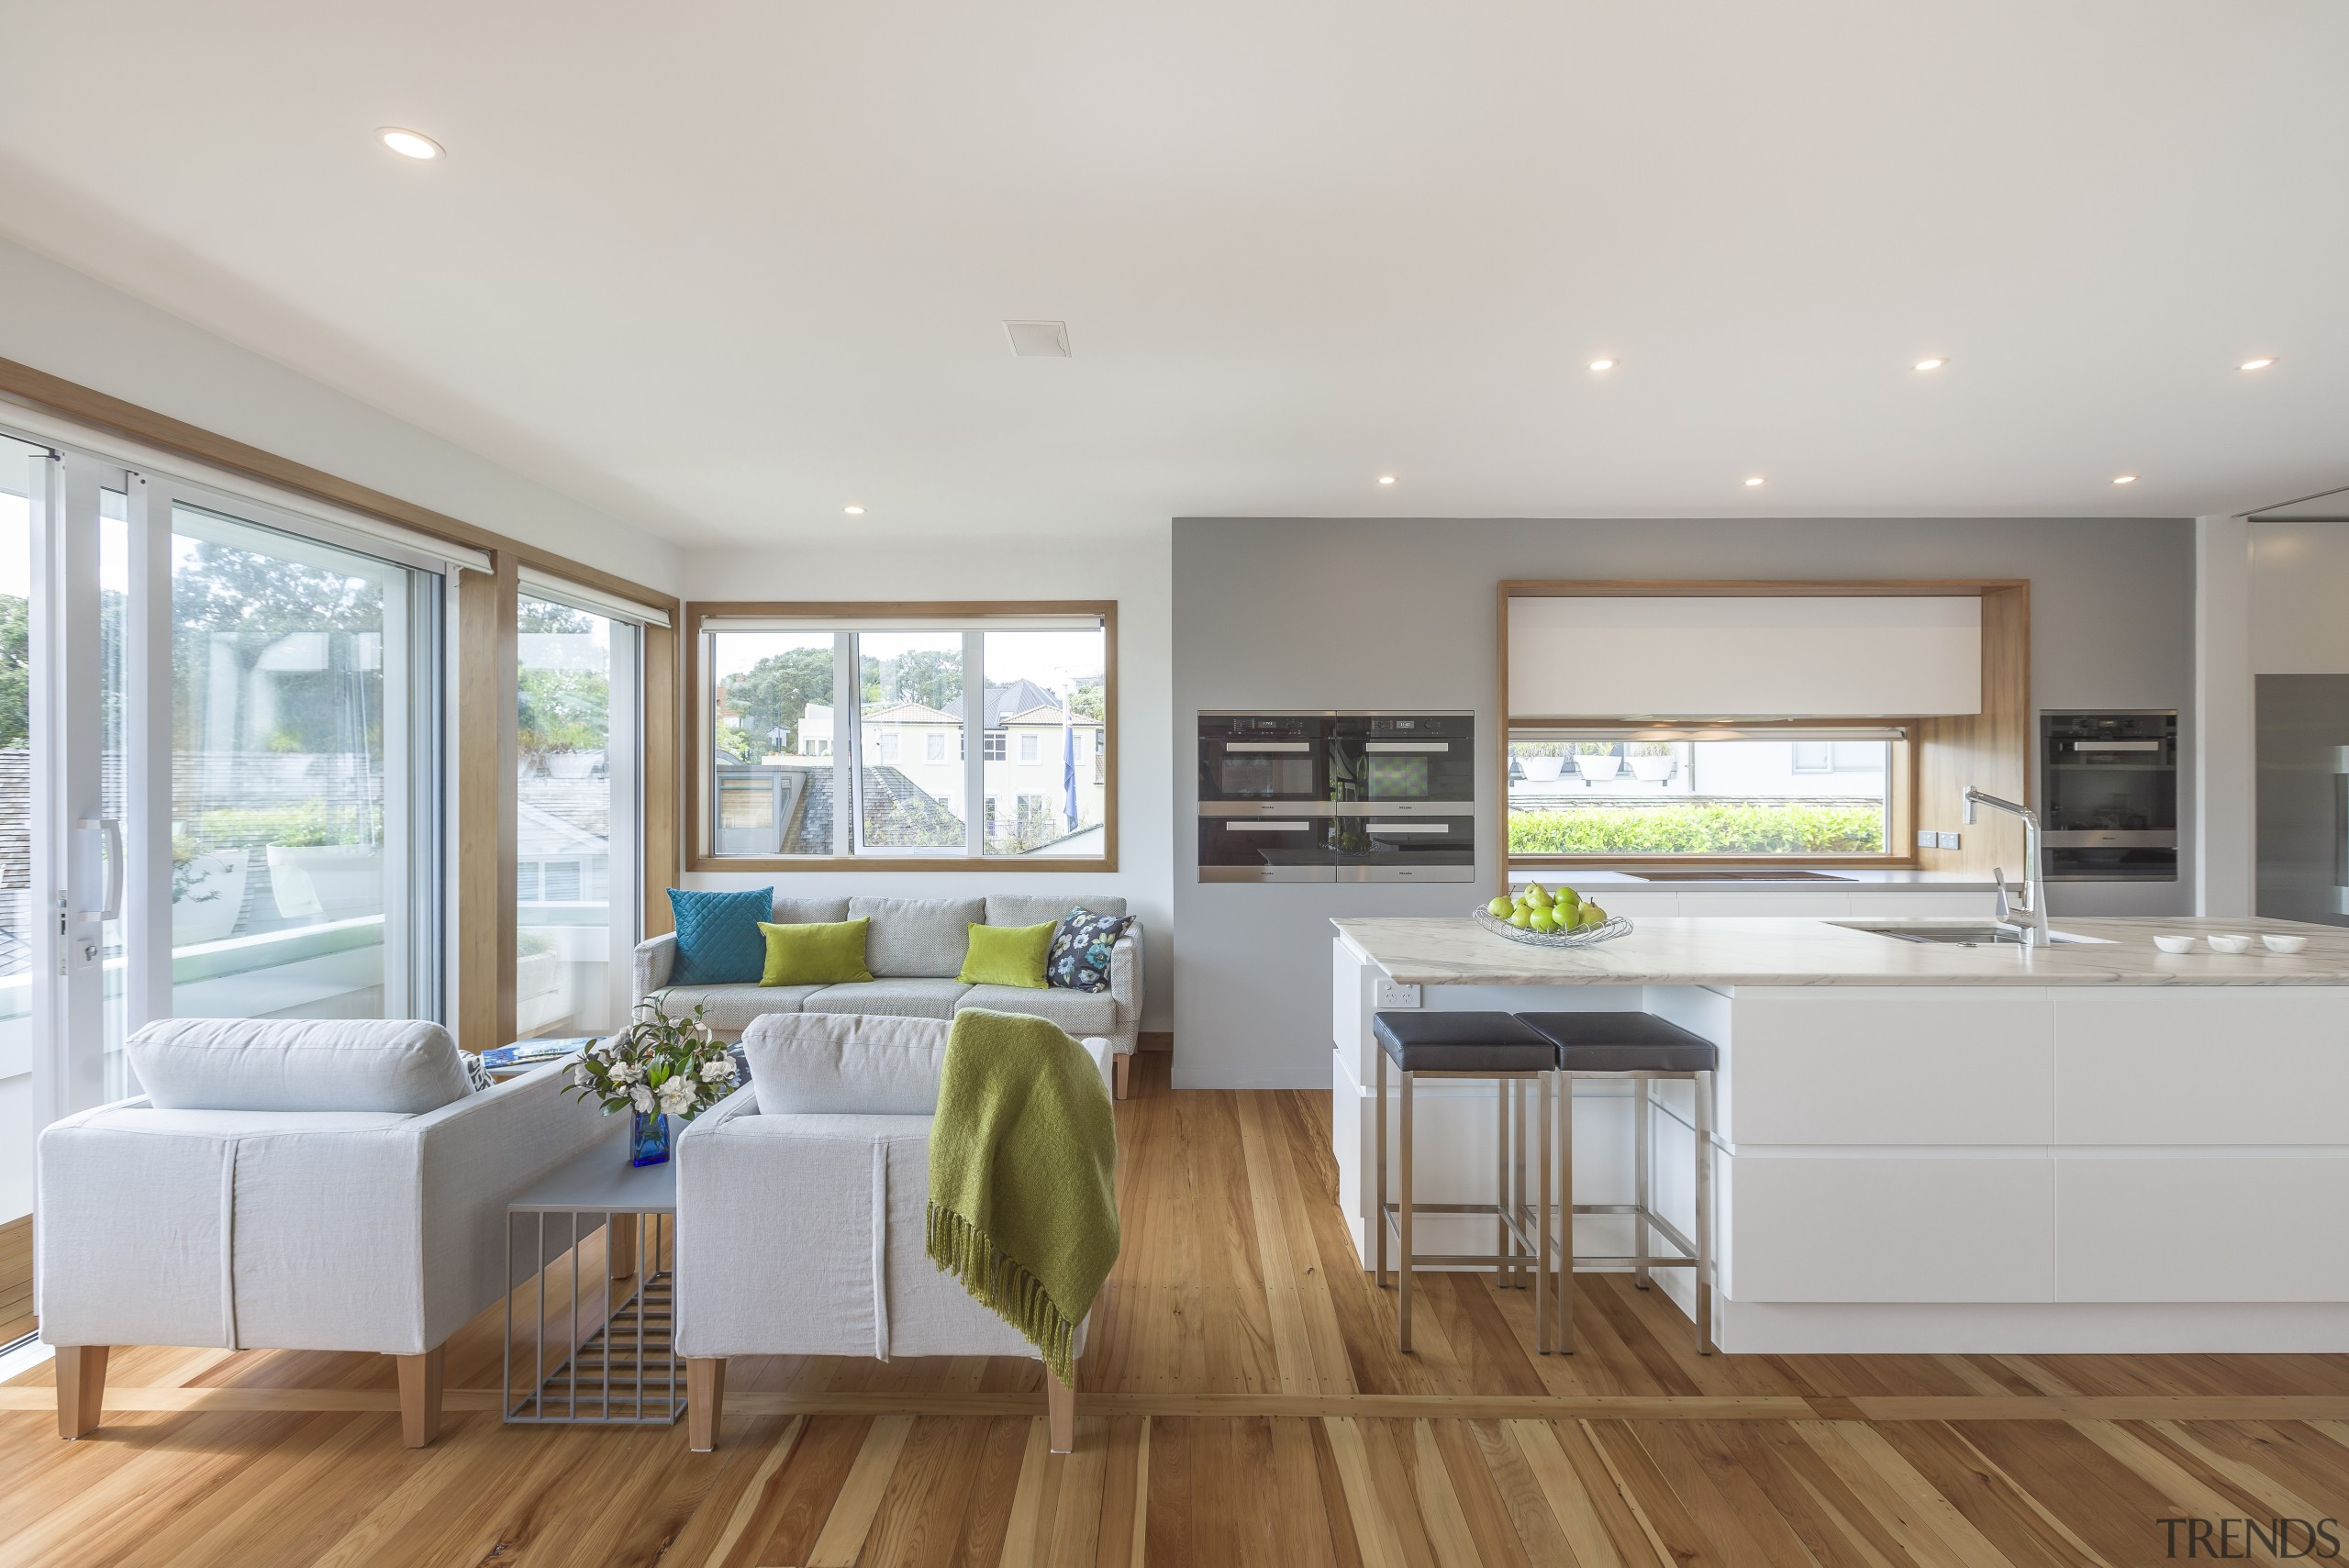 2018 TIDA New Zealand Designer Kitchen Highly Commended floor, interior design, kitchen, living room, real estate, window, gray